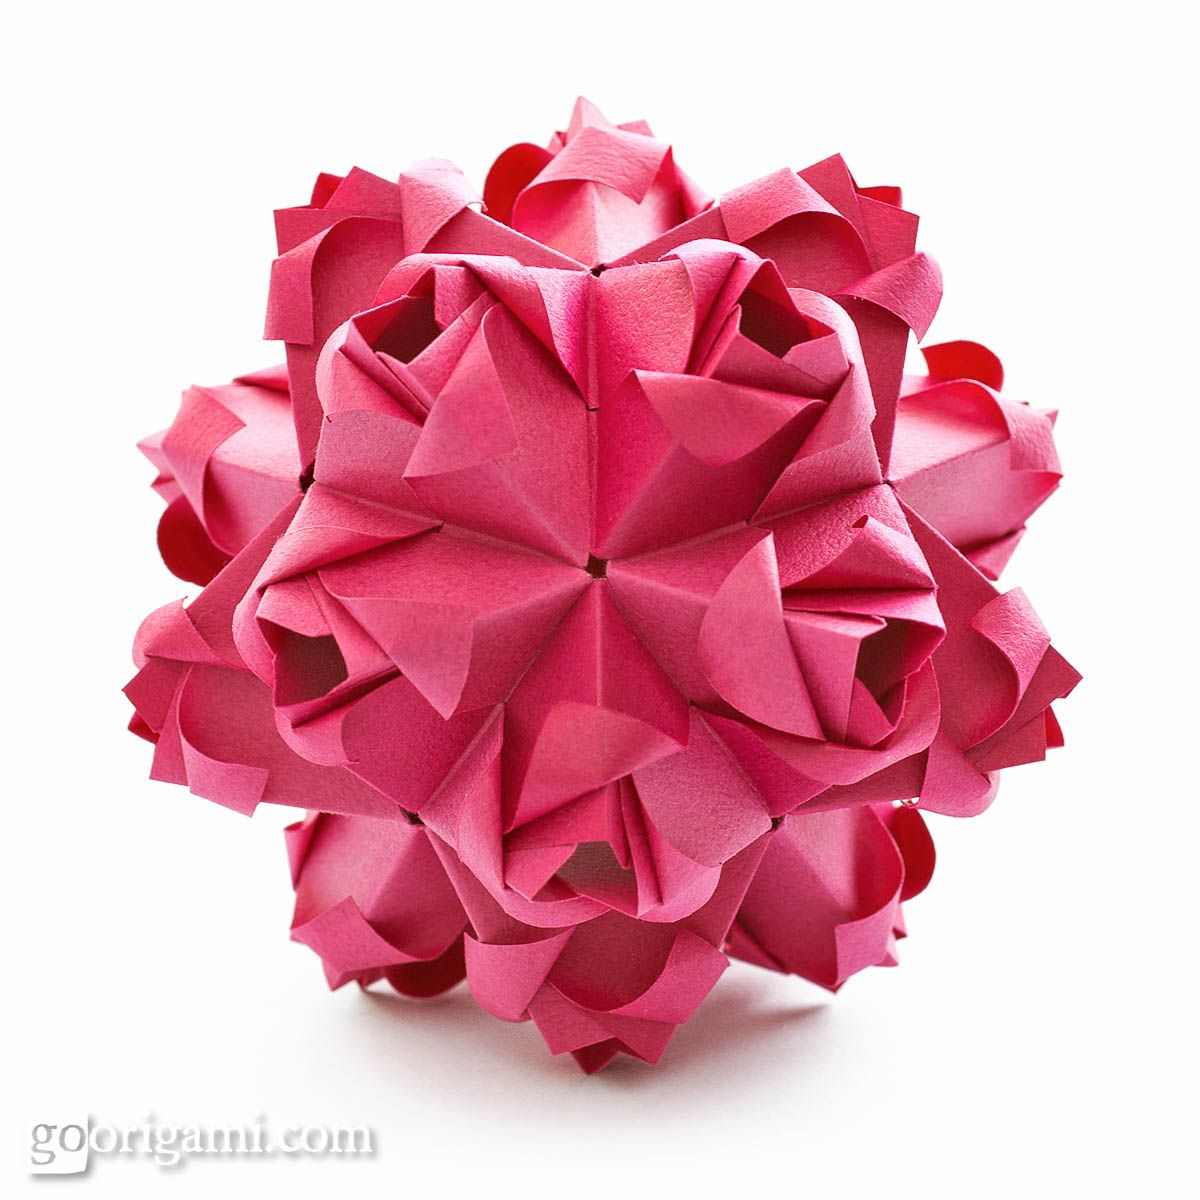 Little roses embroidery pinterest origami diagram and origami diagram for a modular origami ball little roses kusudama designed by maria sinayskaya folded with 30 rectangular sheets of paper assembled without glue mightylinksfo